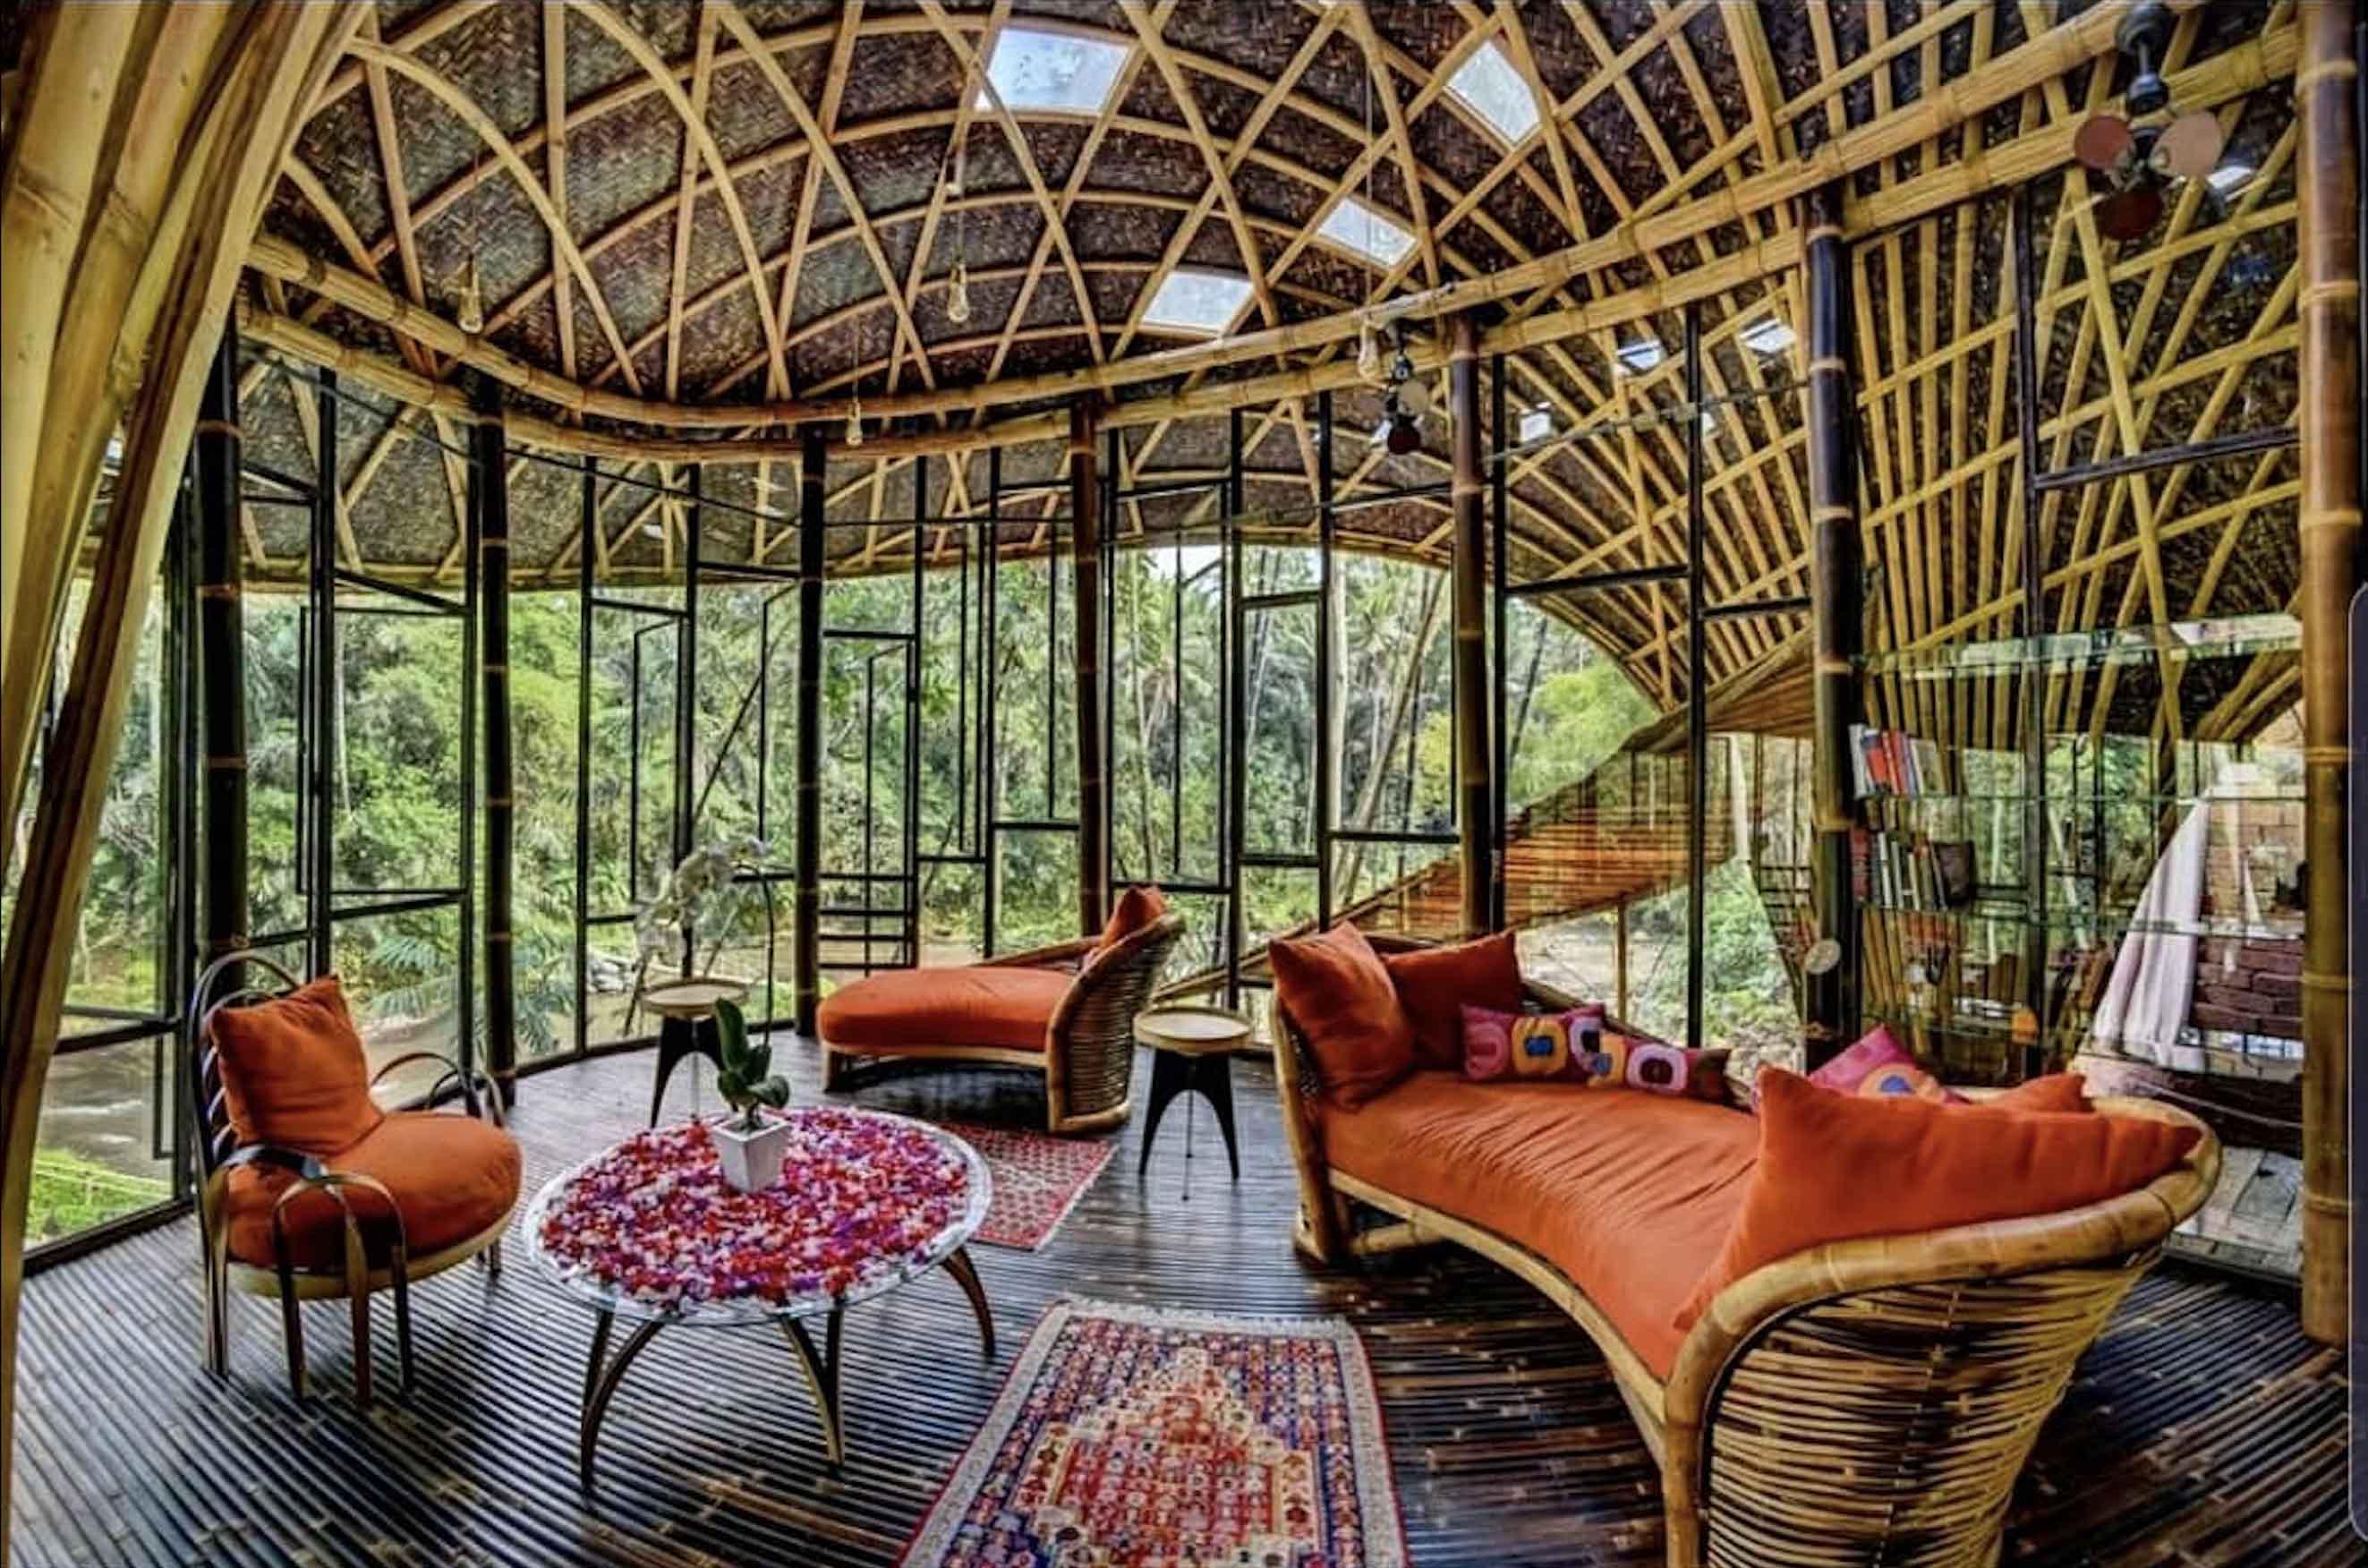 Agung Budi Raharsa | Architecture & Engineering Riverbend Bamboo House - Bali Bali, Indonesia Bali, Indonesia Entrance Tropical  88709